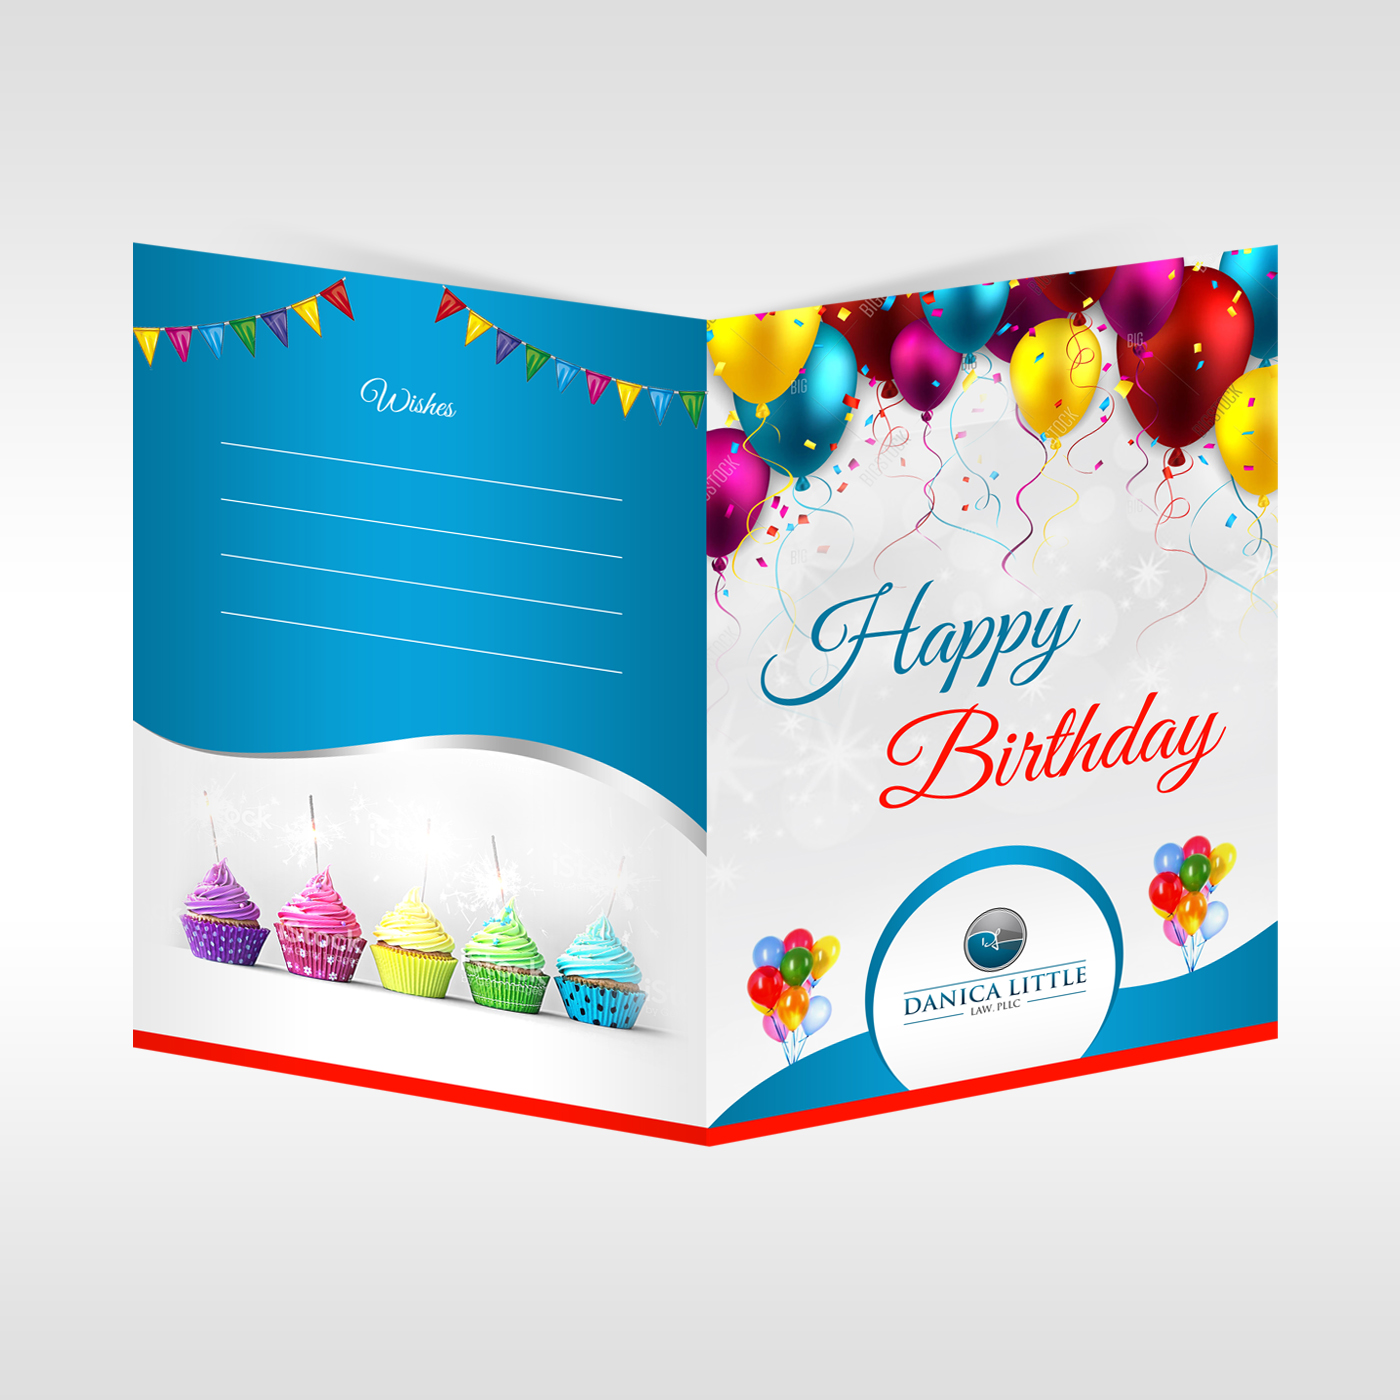 Colorful elegant law firm greeting card design for danica little greeting card design by debdesign for danica little law pllc design 13104170 m4hsunfo